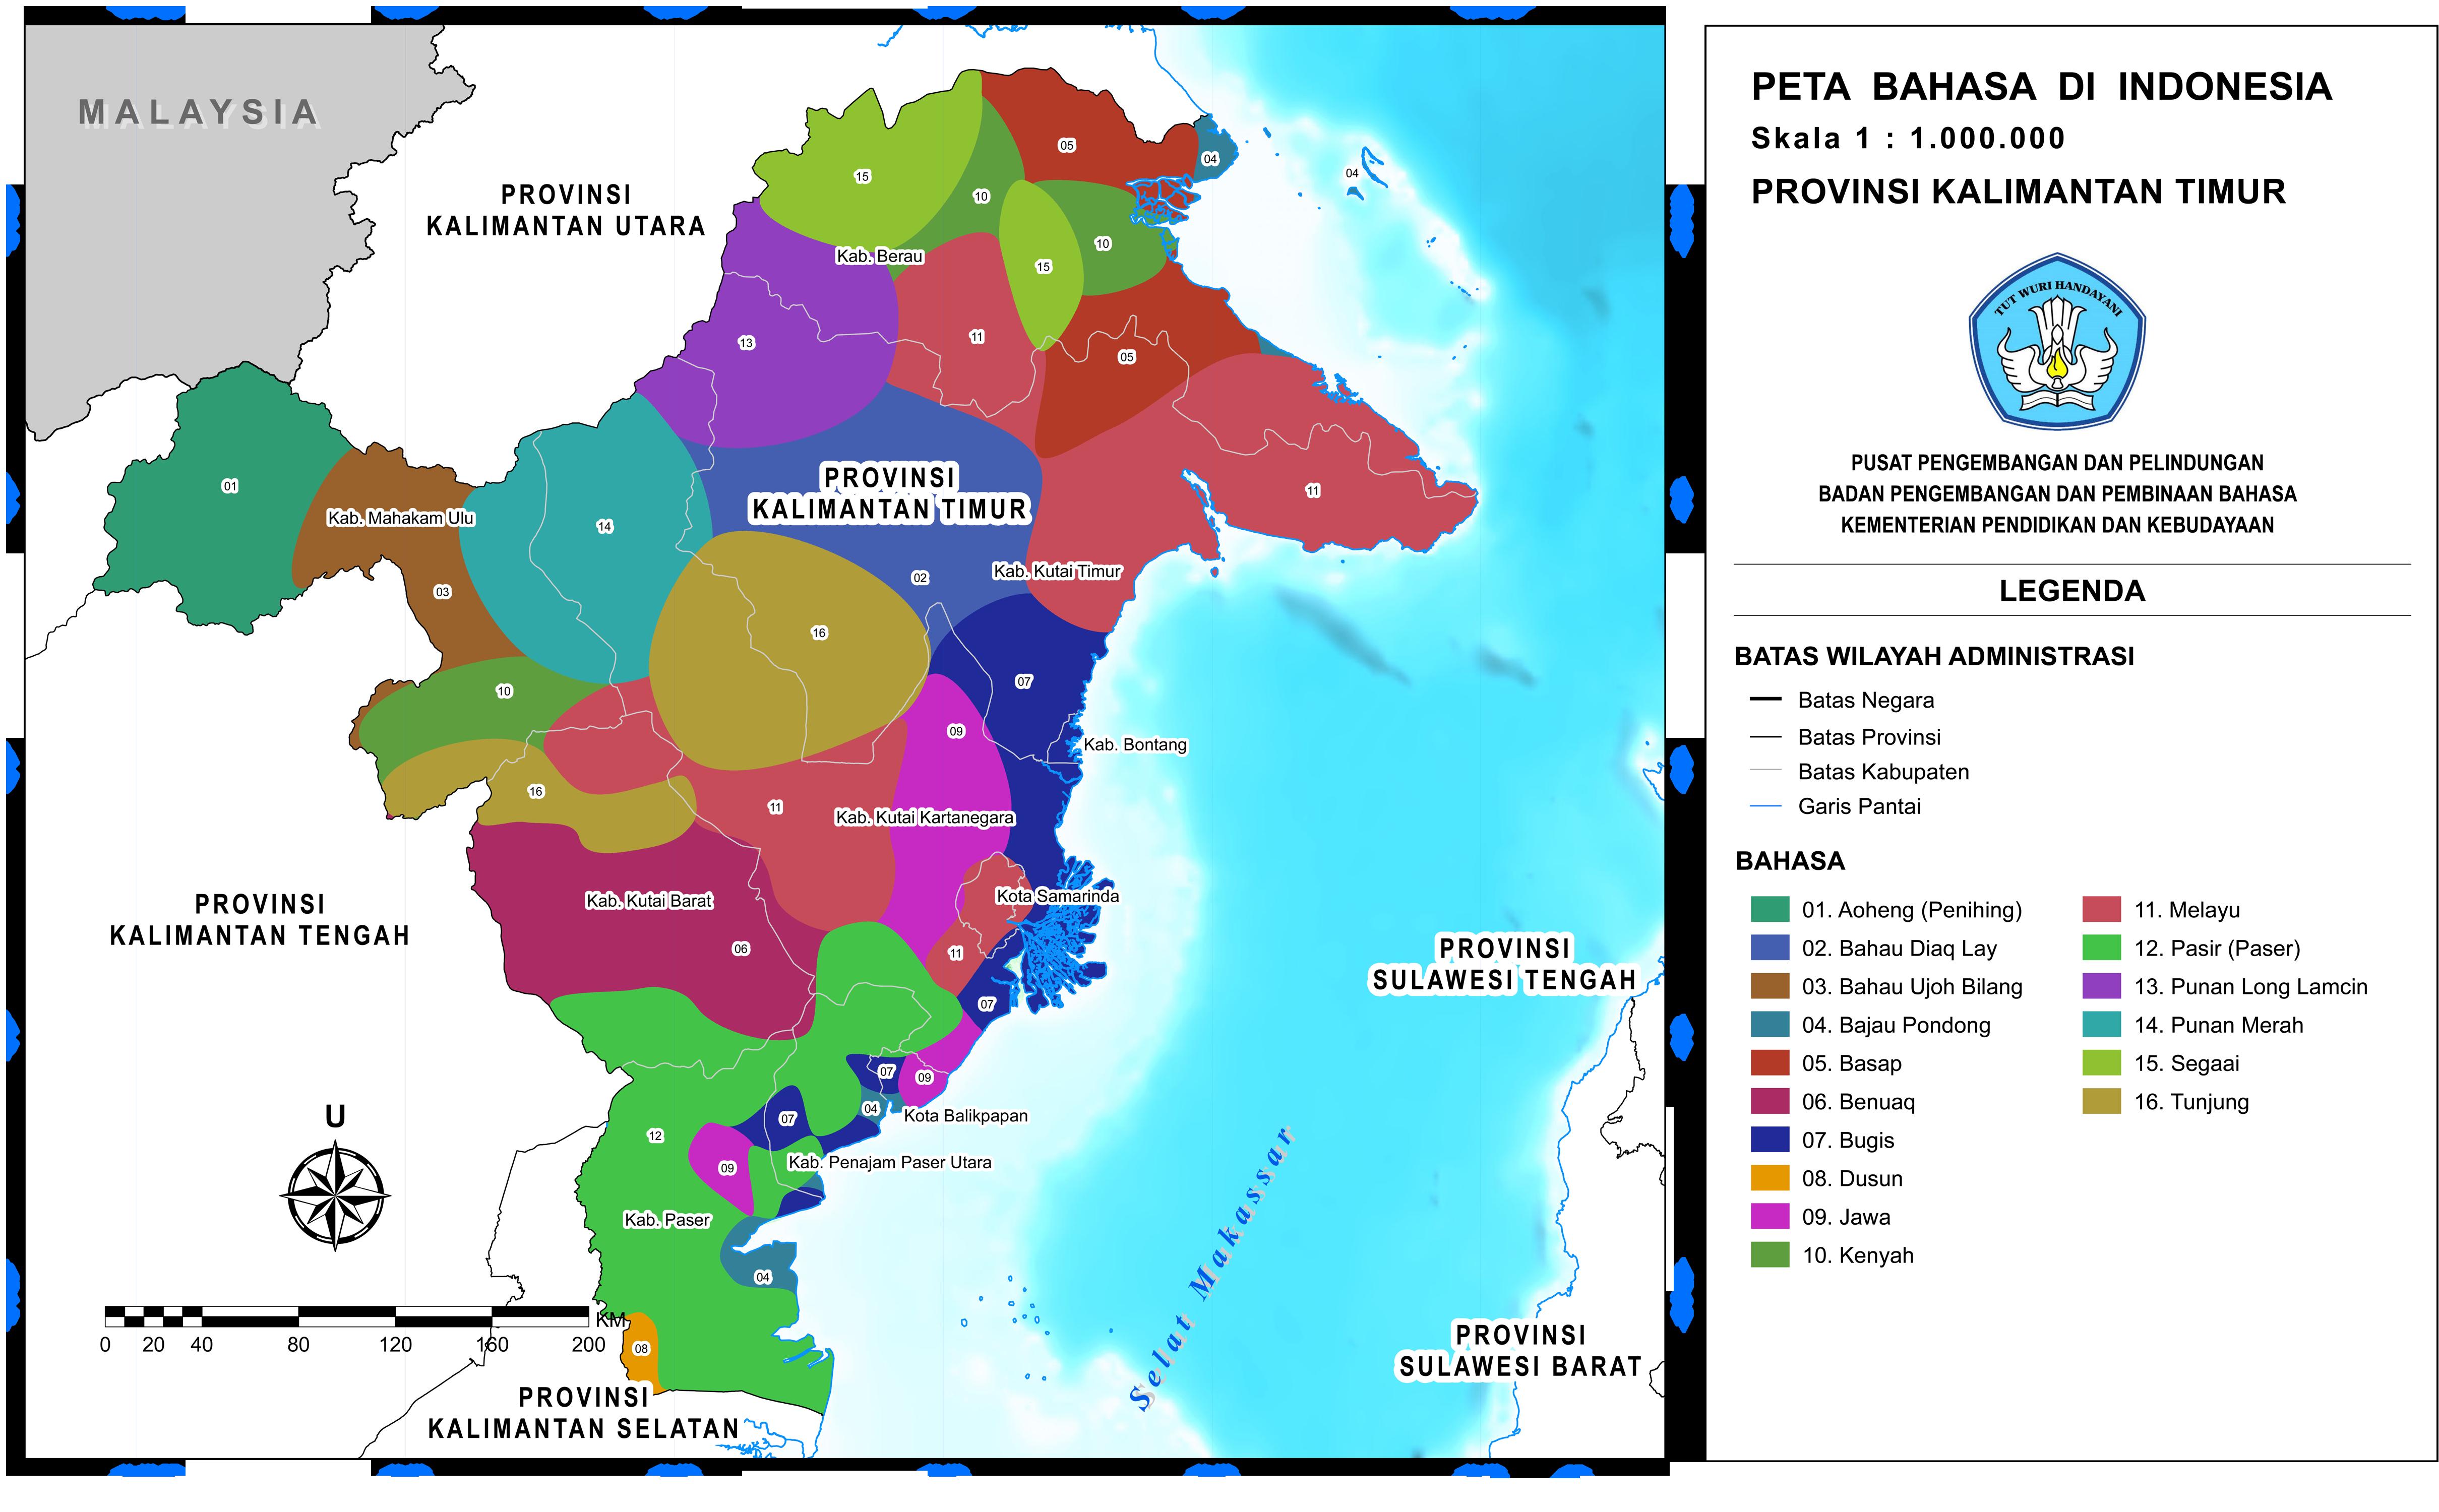 provinsi kalimantan timur peta bahasa provinsi kalimantan timur peta bahasa